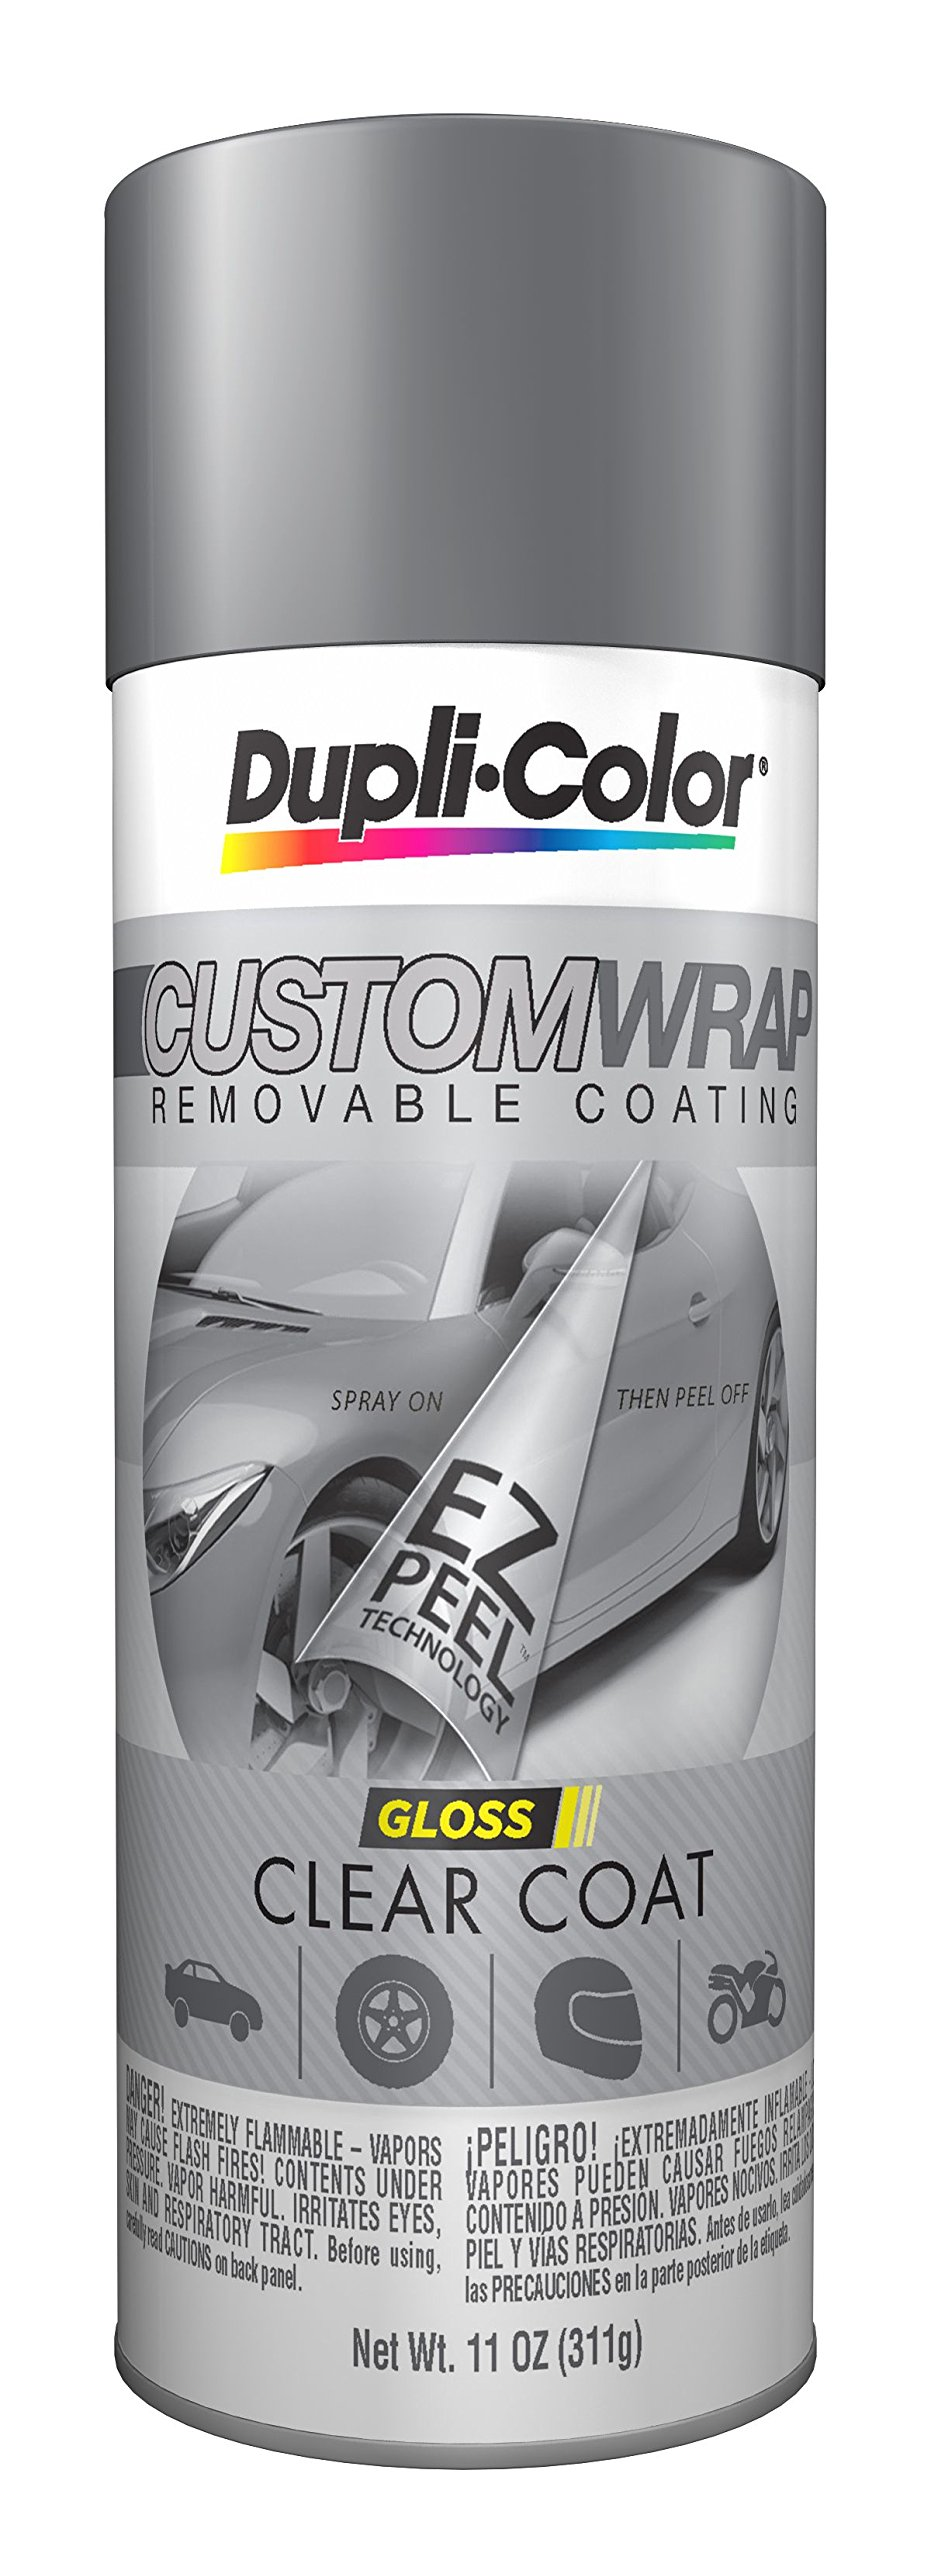 Dupli-Color ECWRC9017-6PK Custom Wrap Removable Coating - 11 fl. oz., (Pack of 6)